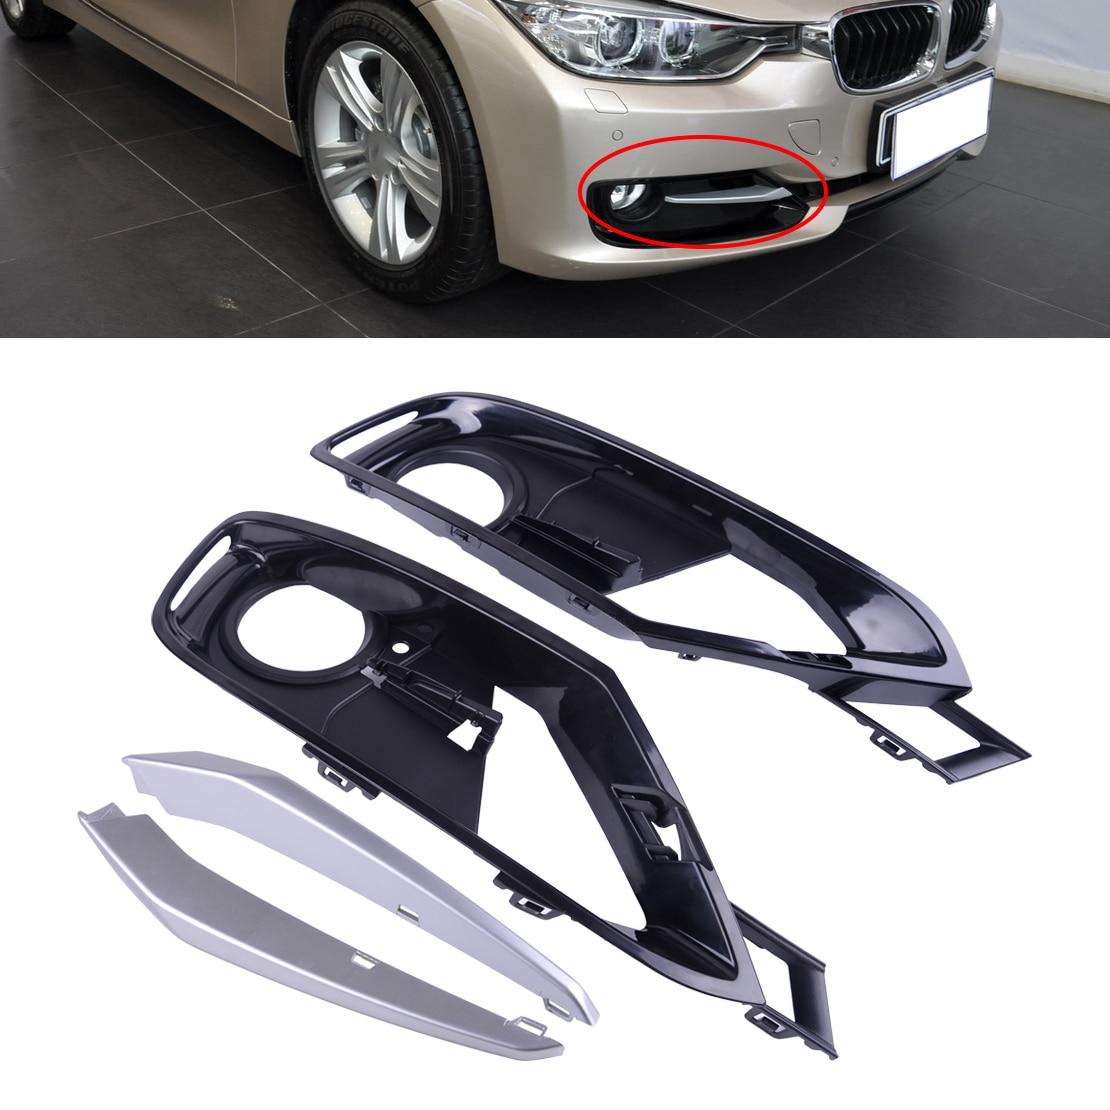 DWCX 2 rejilla de luz antiniebla del parachoques delantero parrilla 2 borde Chrom 51117300739 51117300740 ajuste para BMW Serie 3 F30/F31 2012-2015